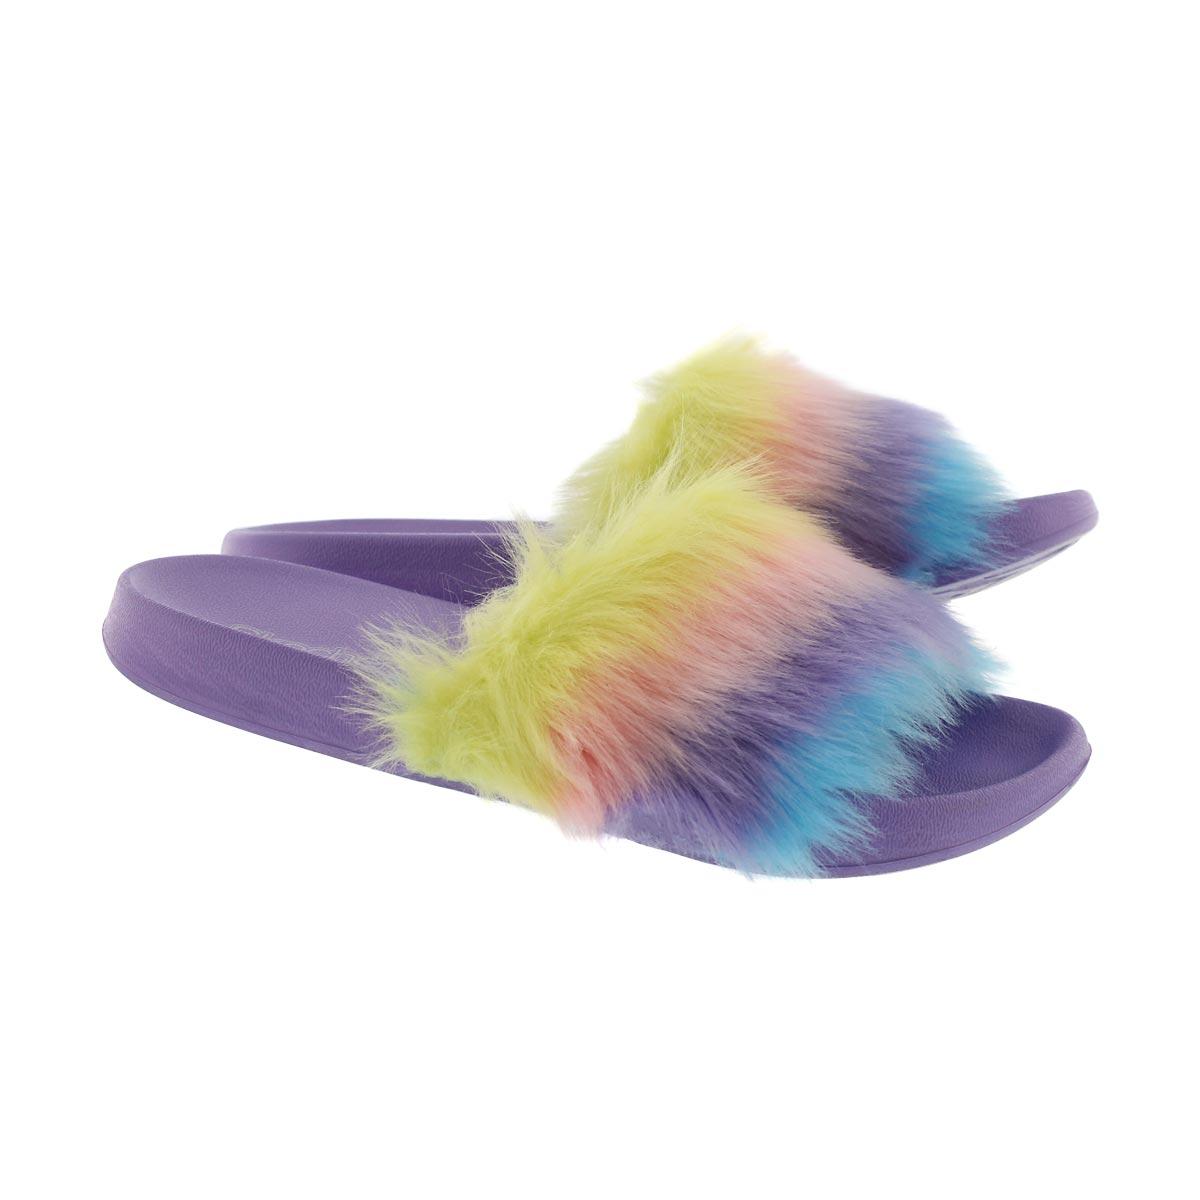 Grls TBA mlti/ppl ombre fur slide sandal